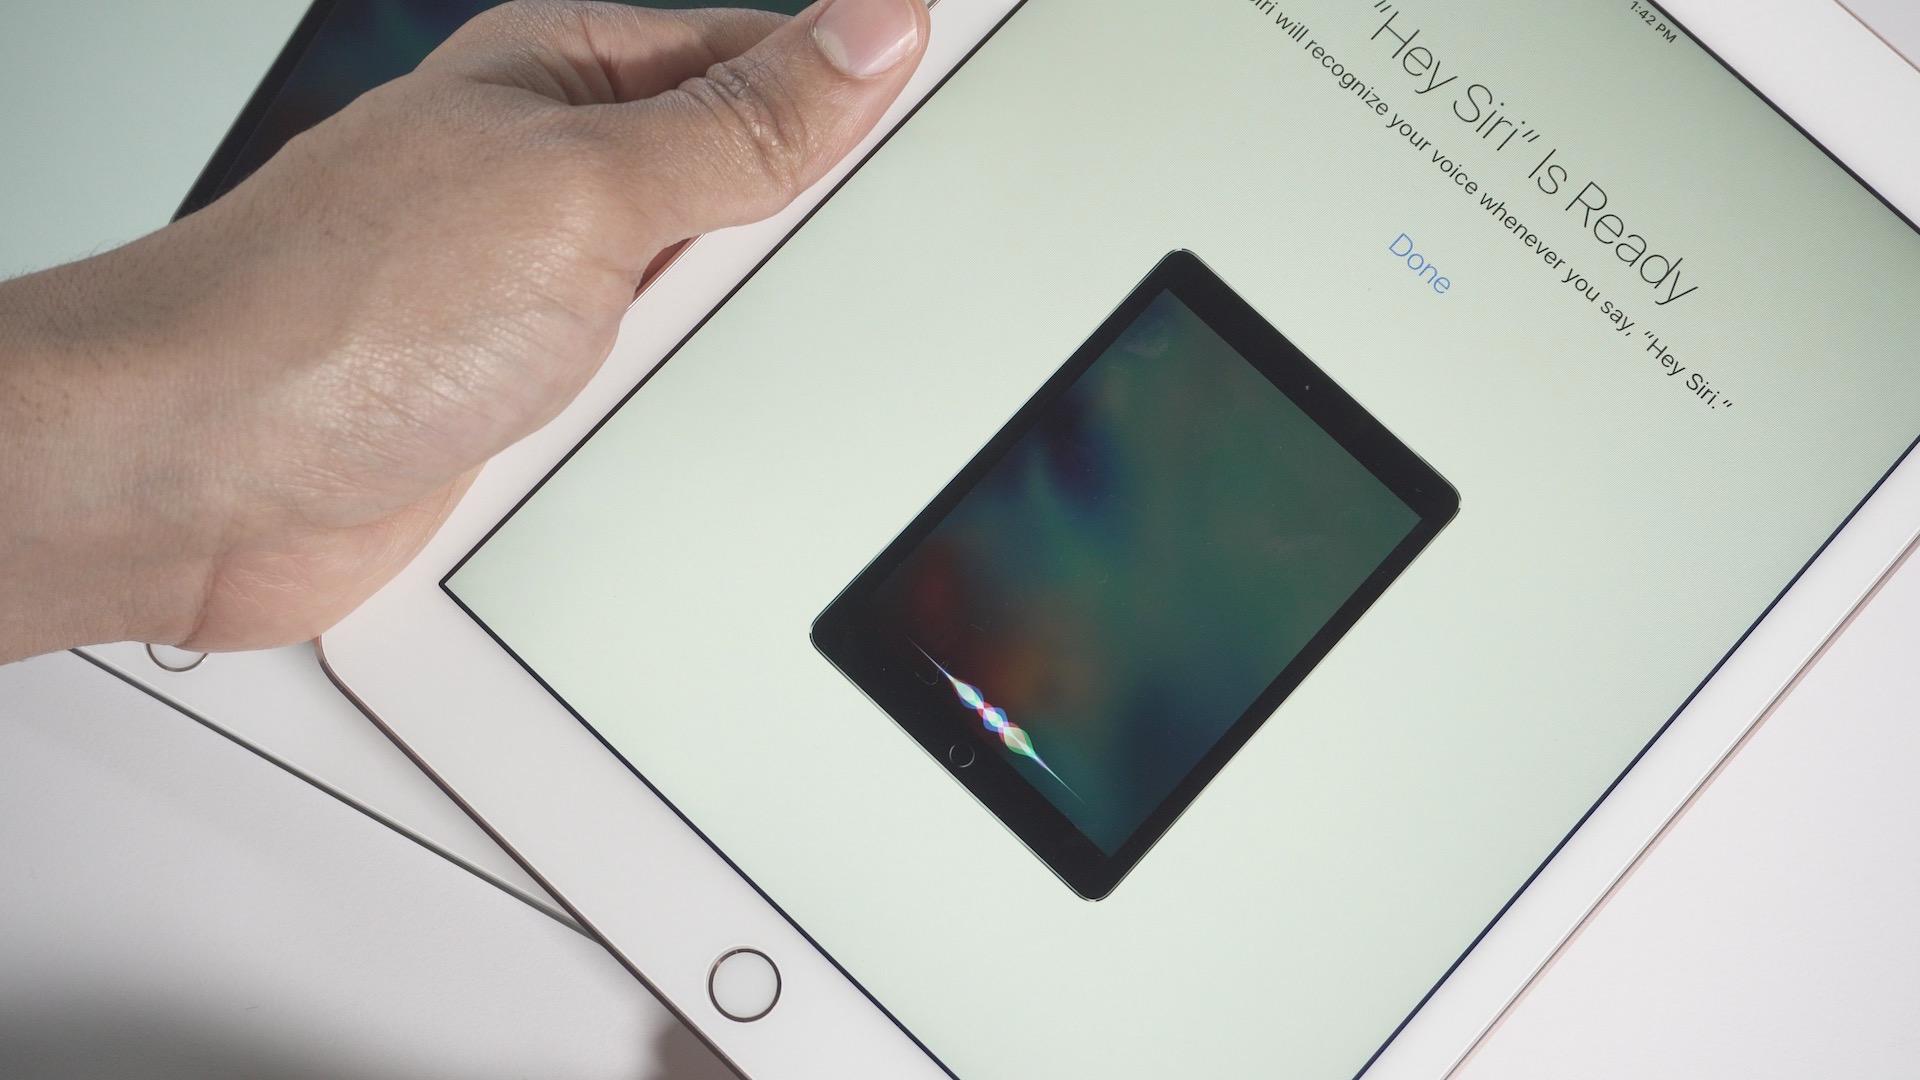 iPad Untethered Hey Siri